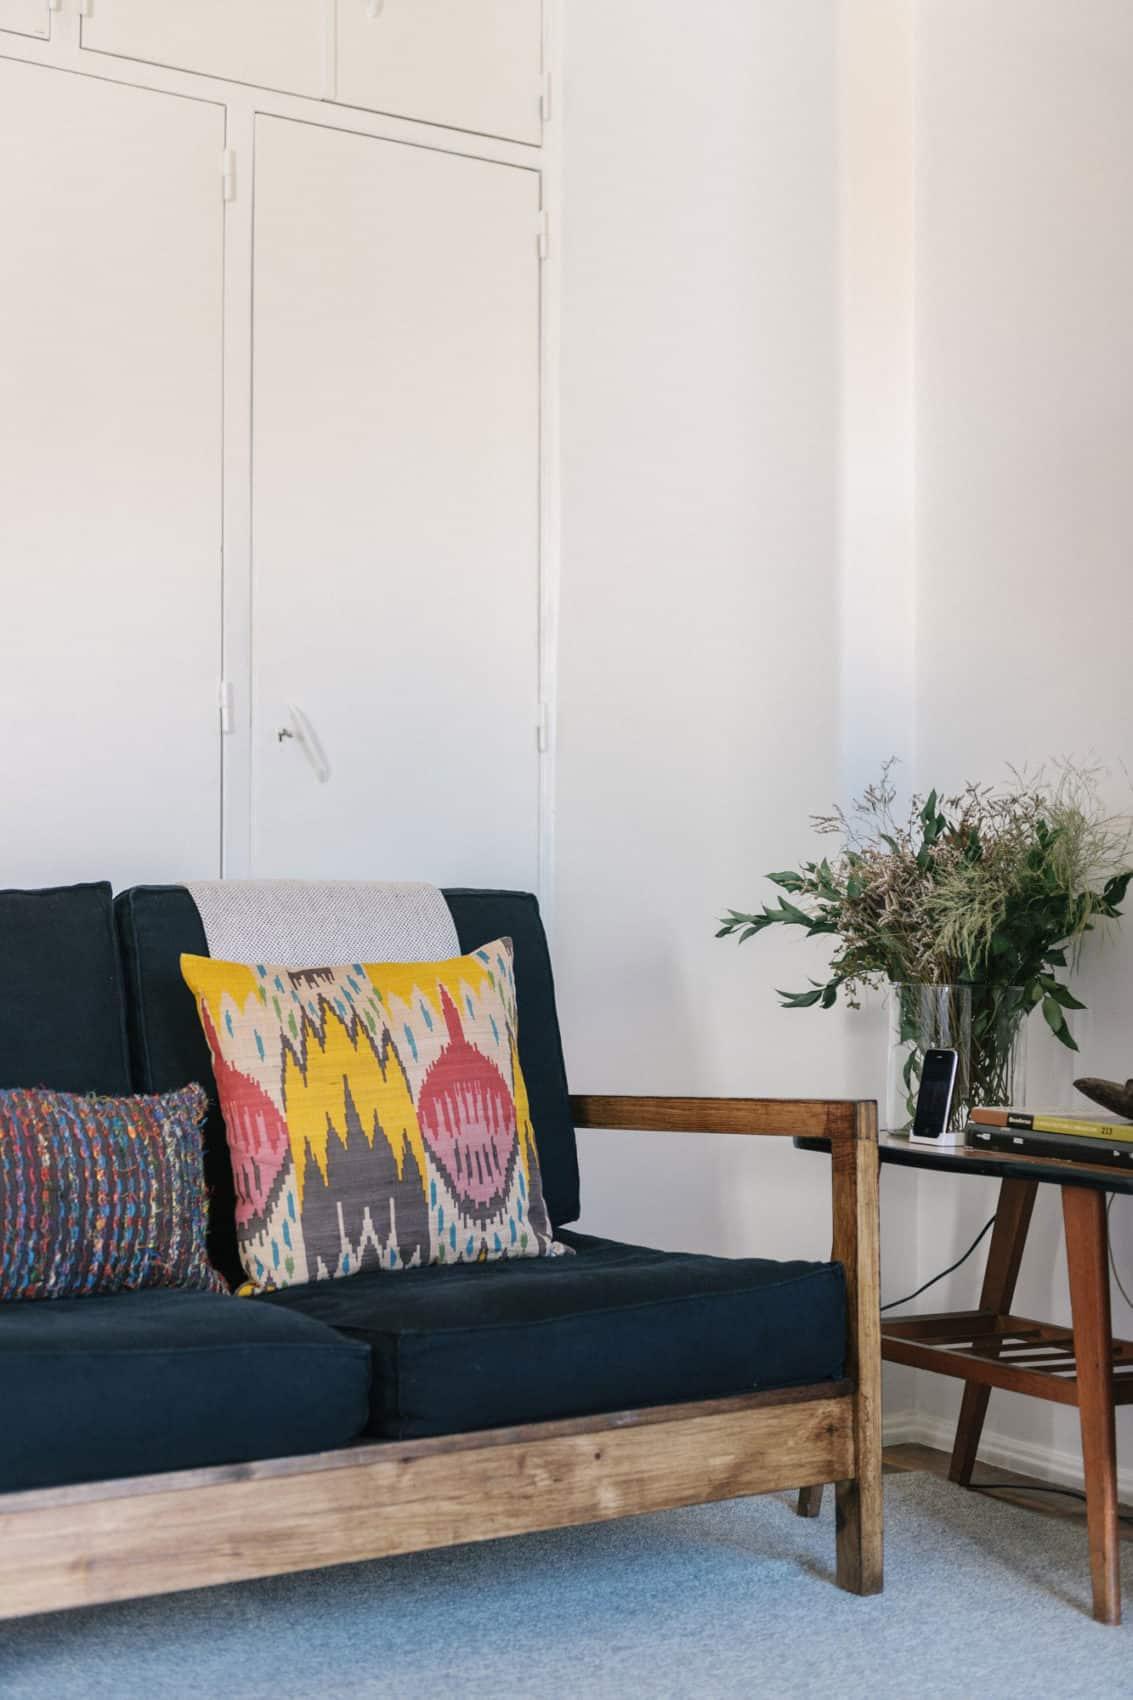 Apartment in Lisbon by Ark.studio (2)